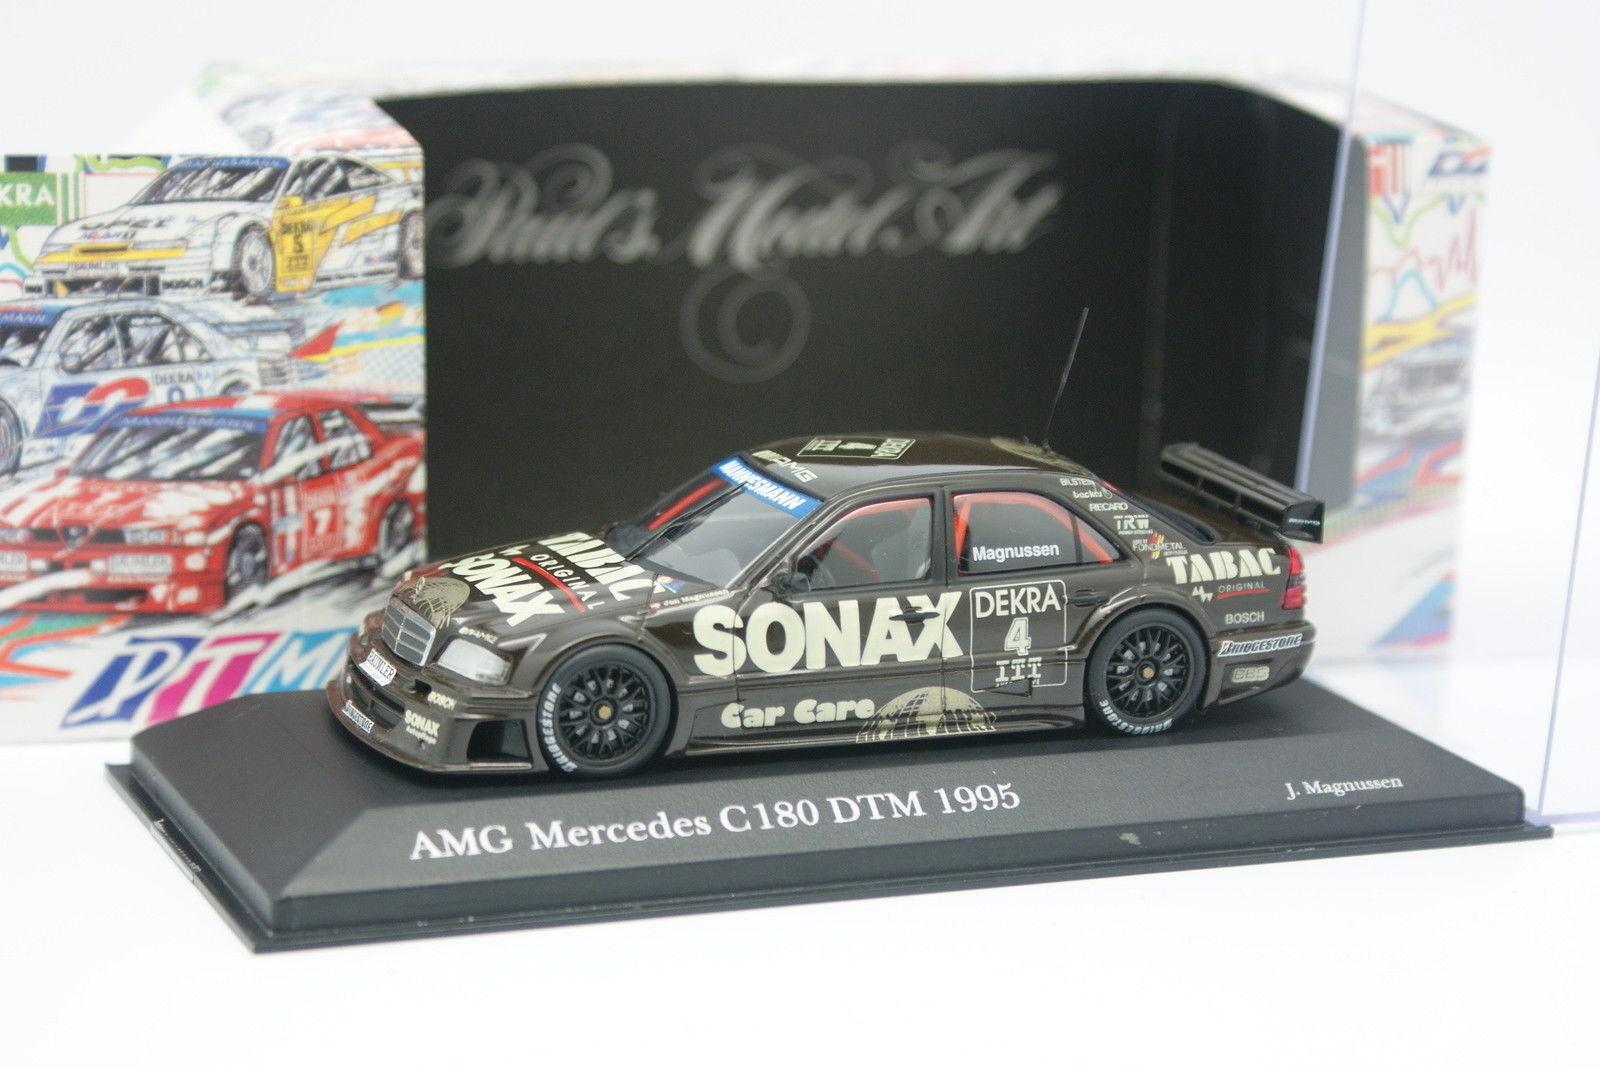 Minichamps 1 43 - Mercedes C 180 Klasse AMG DTM 1995 Magnussen N°4